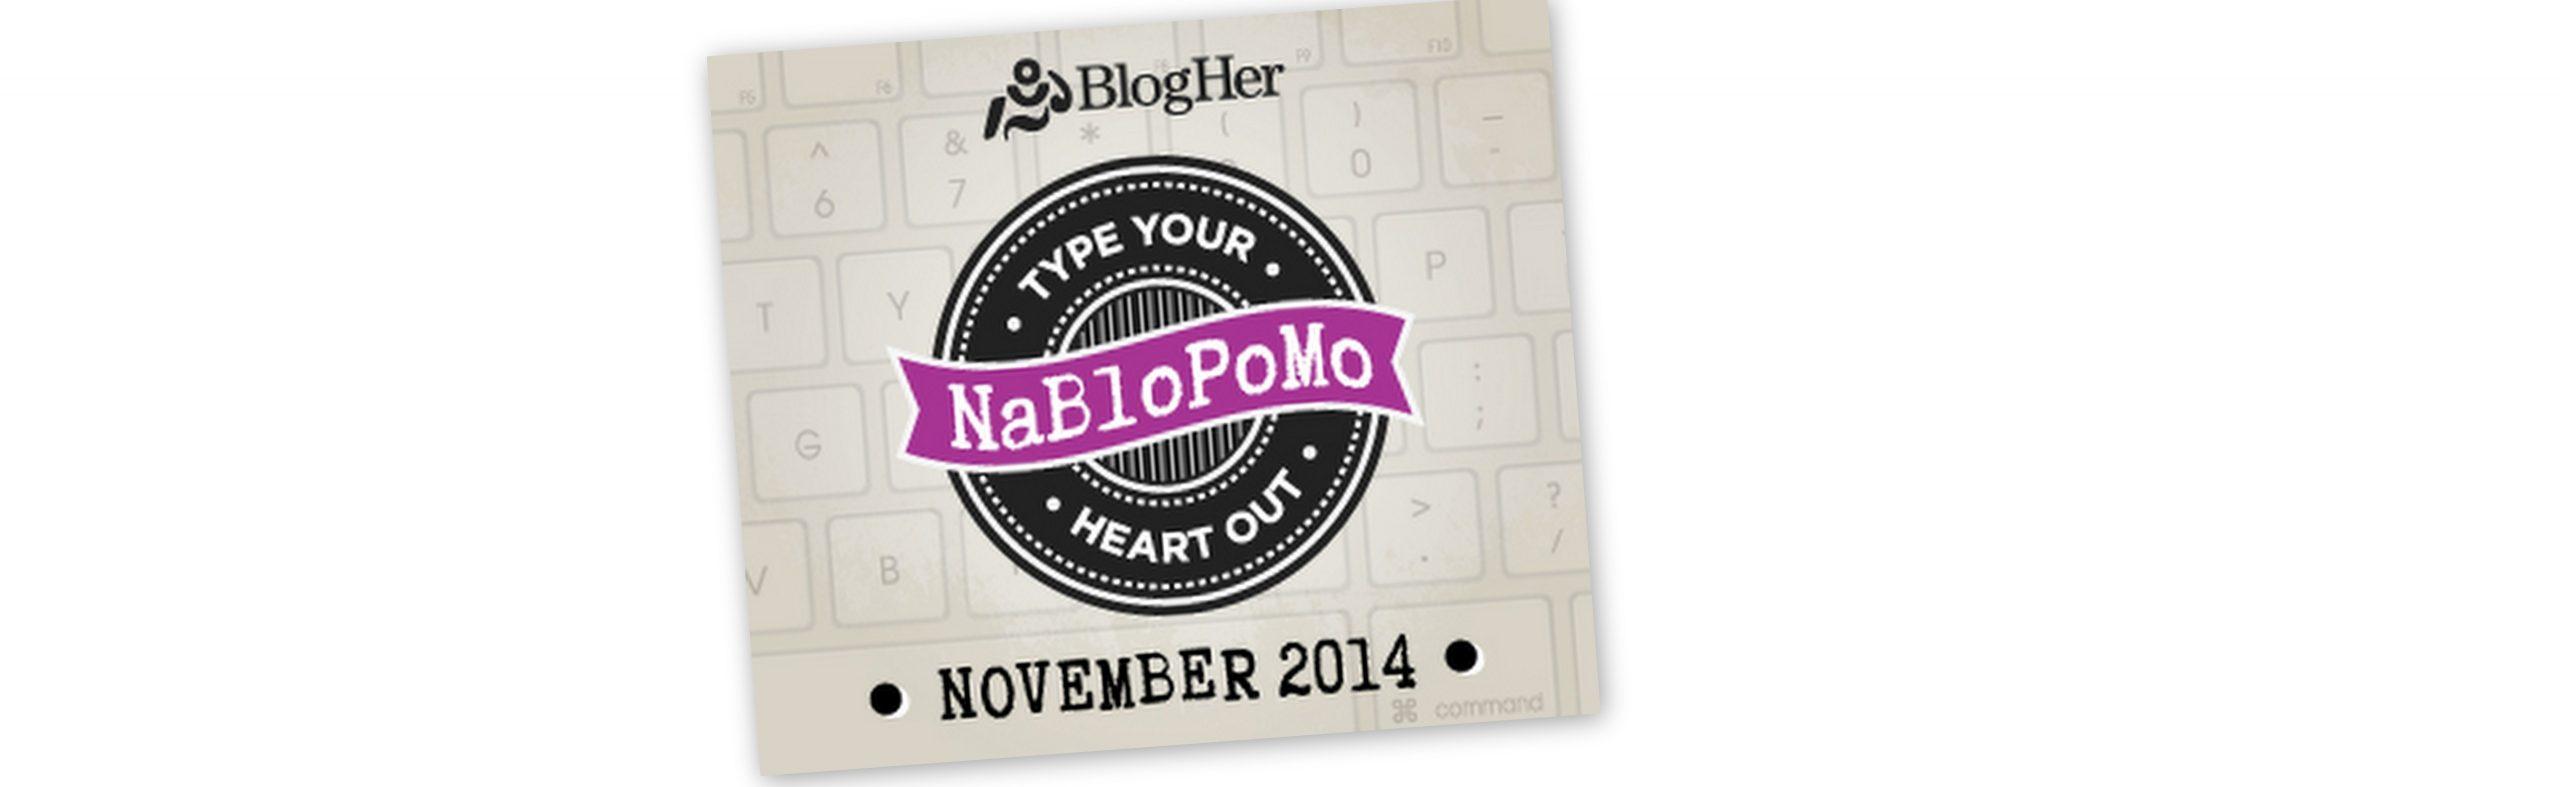 Reflecting on NaBloPoMO 2014